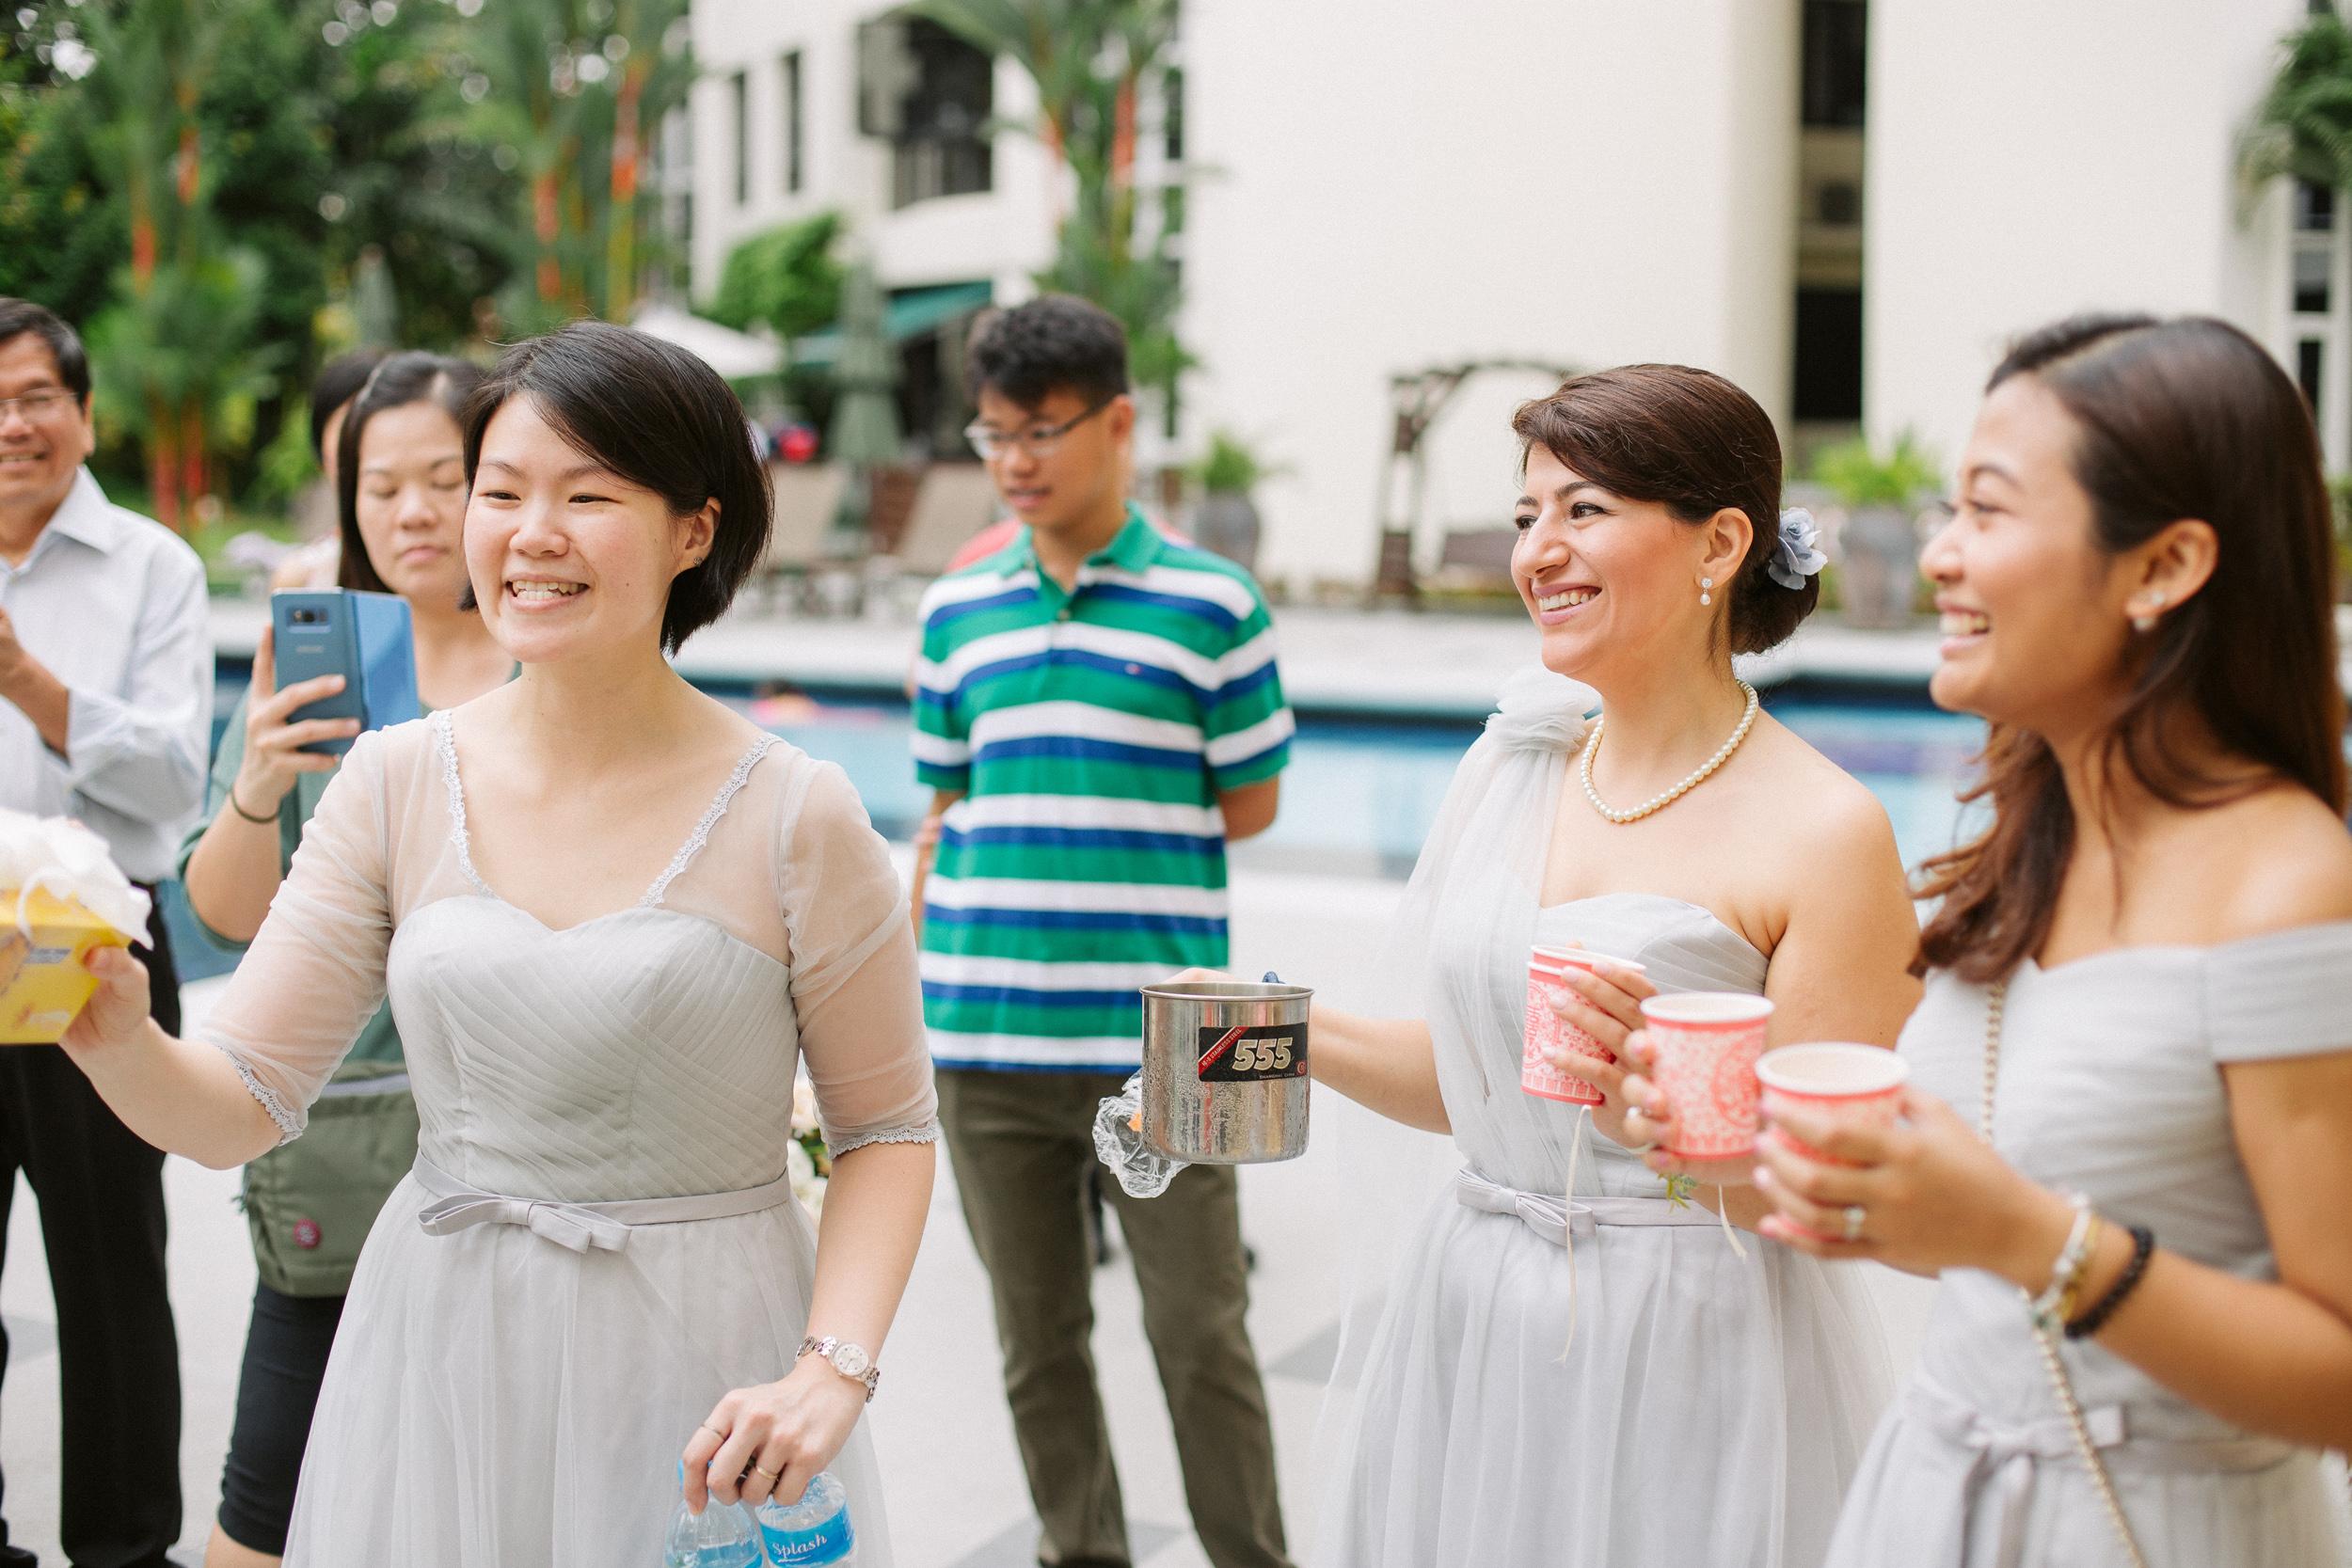 singapore-wedding-photographer-cheryl-matthew-fullerton-hotel-wedding-08.jpg